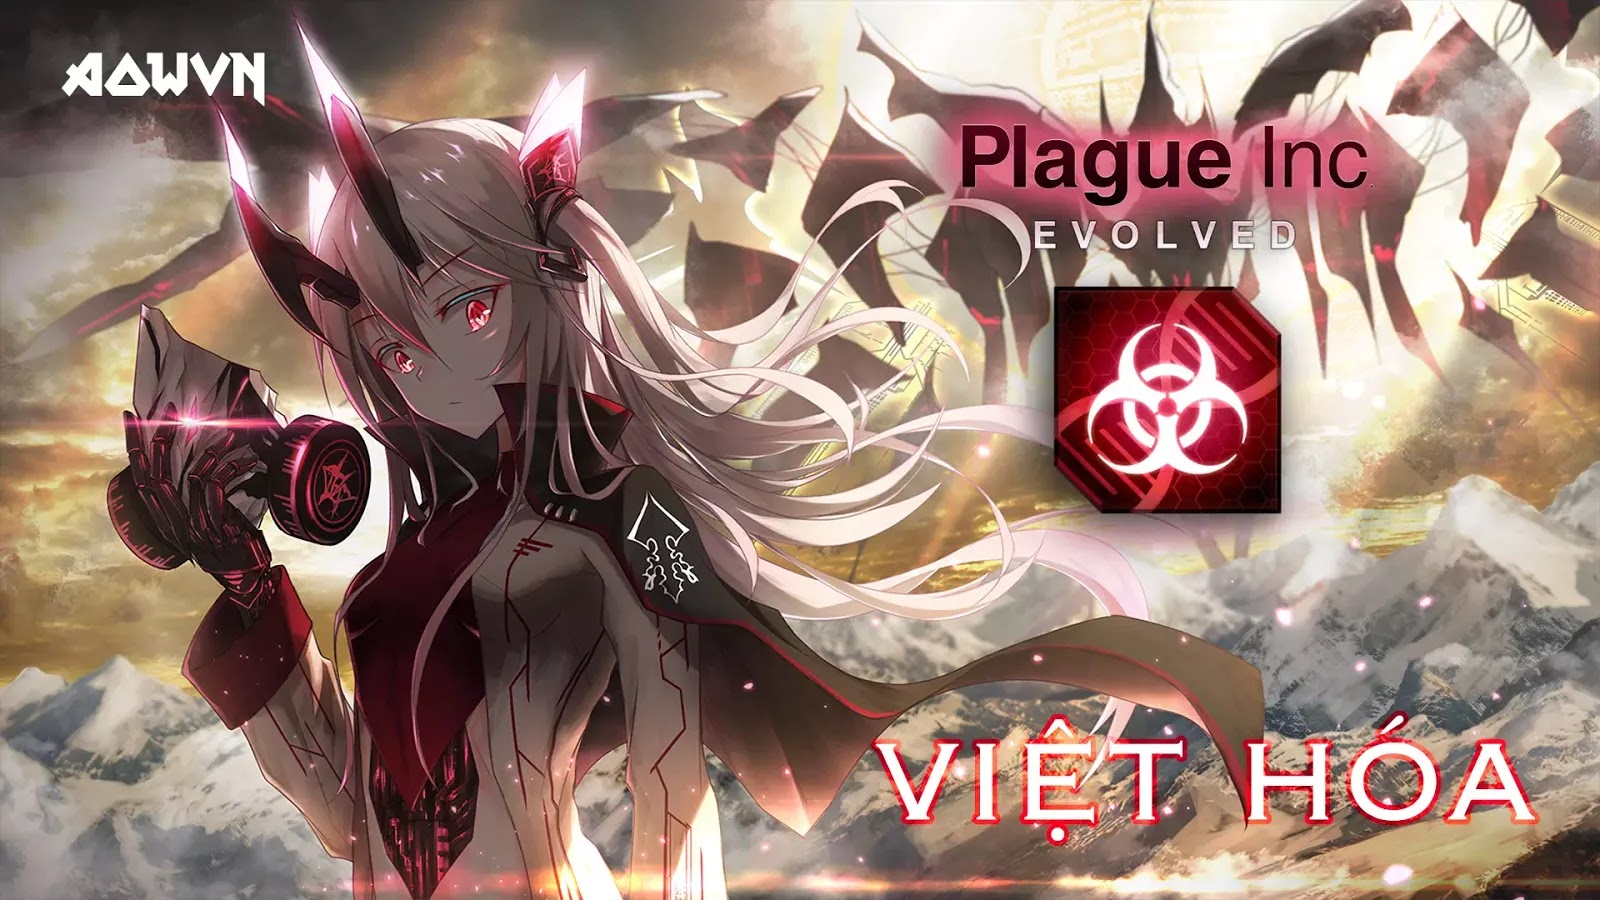 game Plague viet hoa cho android va pc aowvn%2B%25285%2529 - [ HOT ] Game Plague Inc Evolved Việt Hóa | Android PC OFFLINE - Nhập Vai Làm Kẻ Ác ?